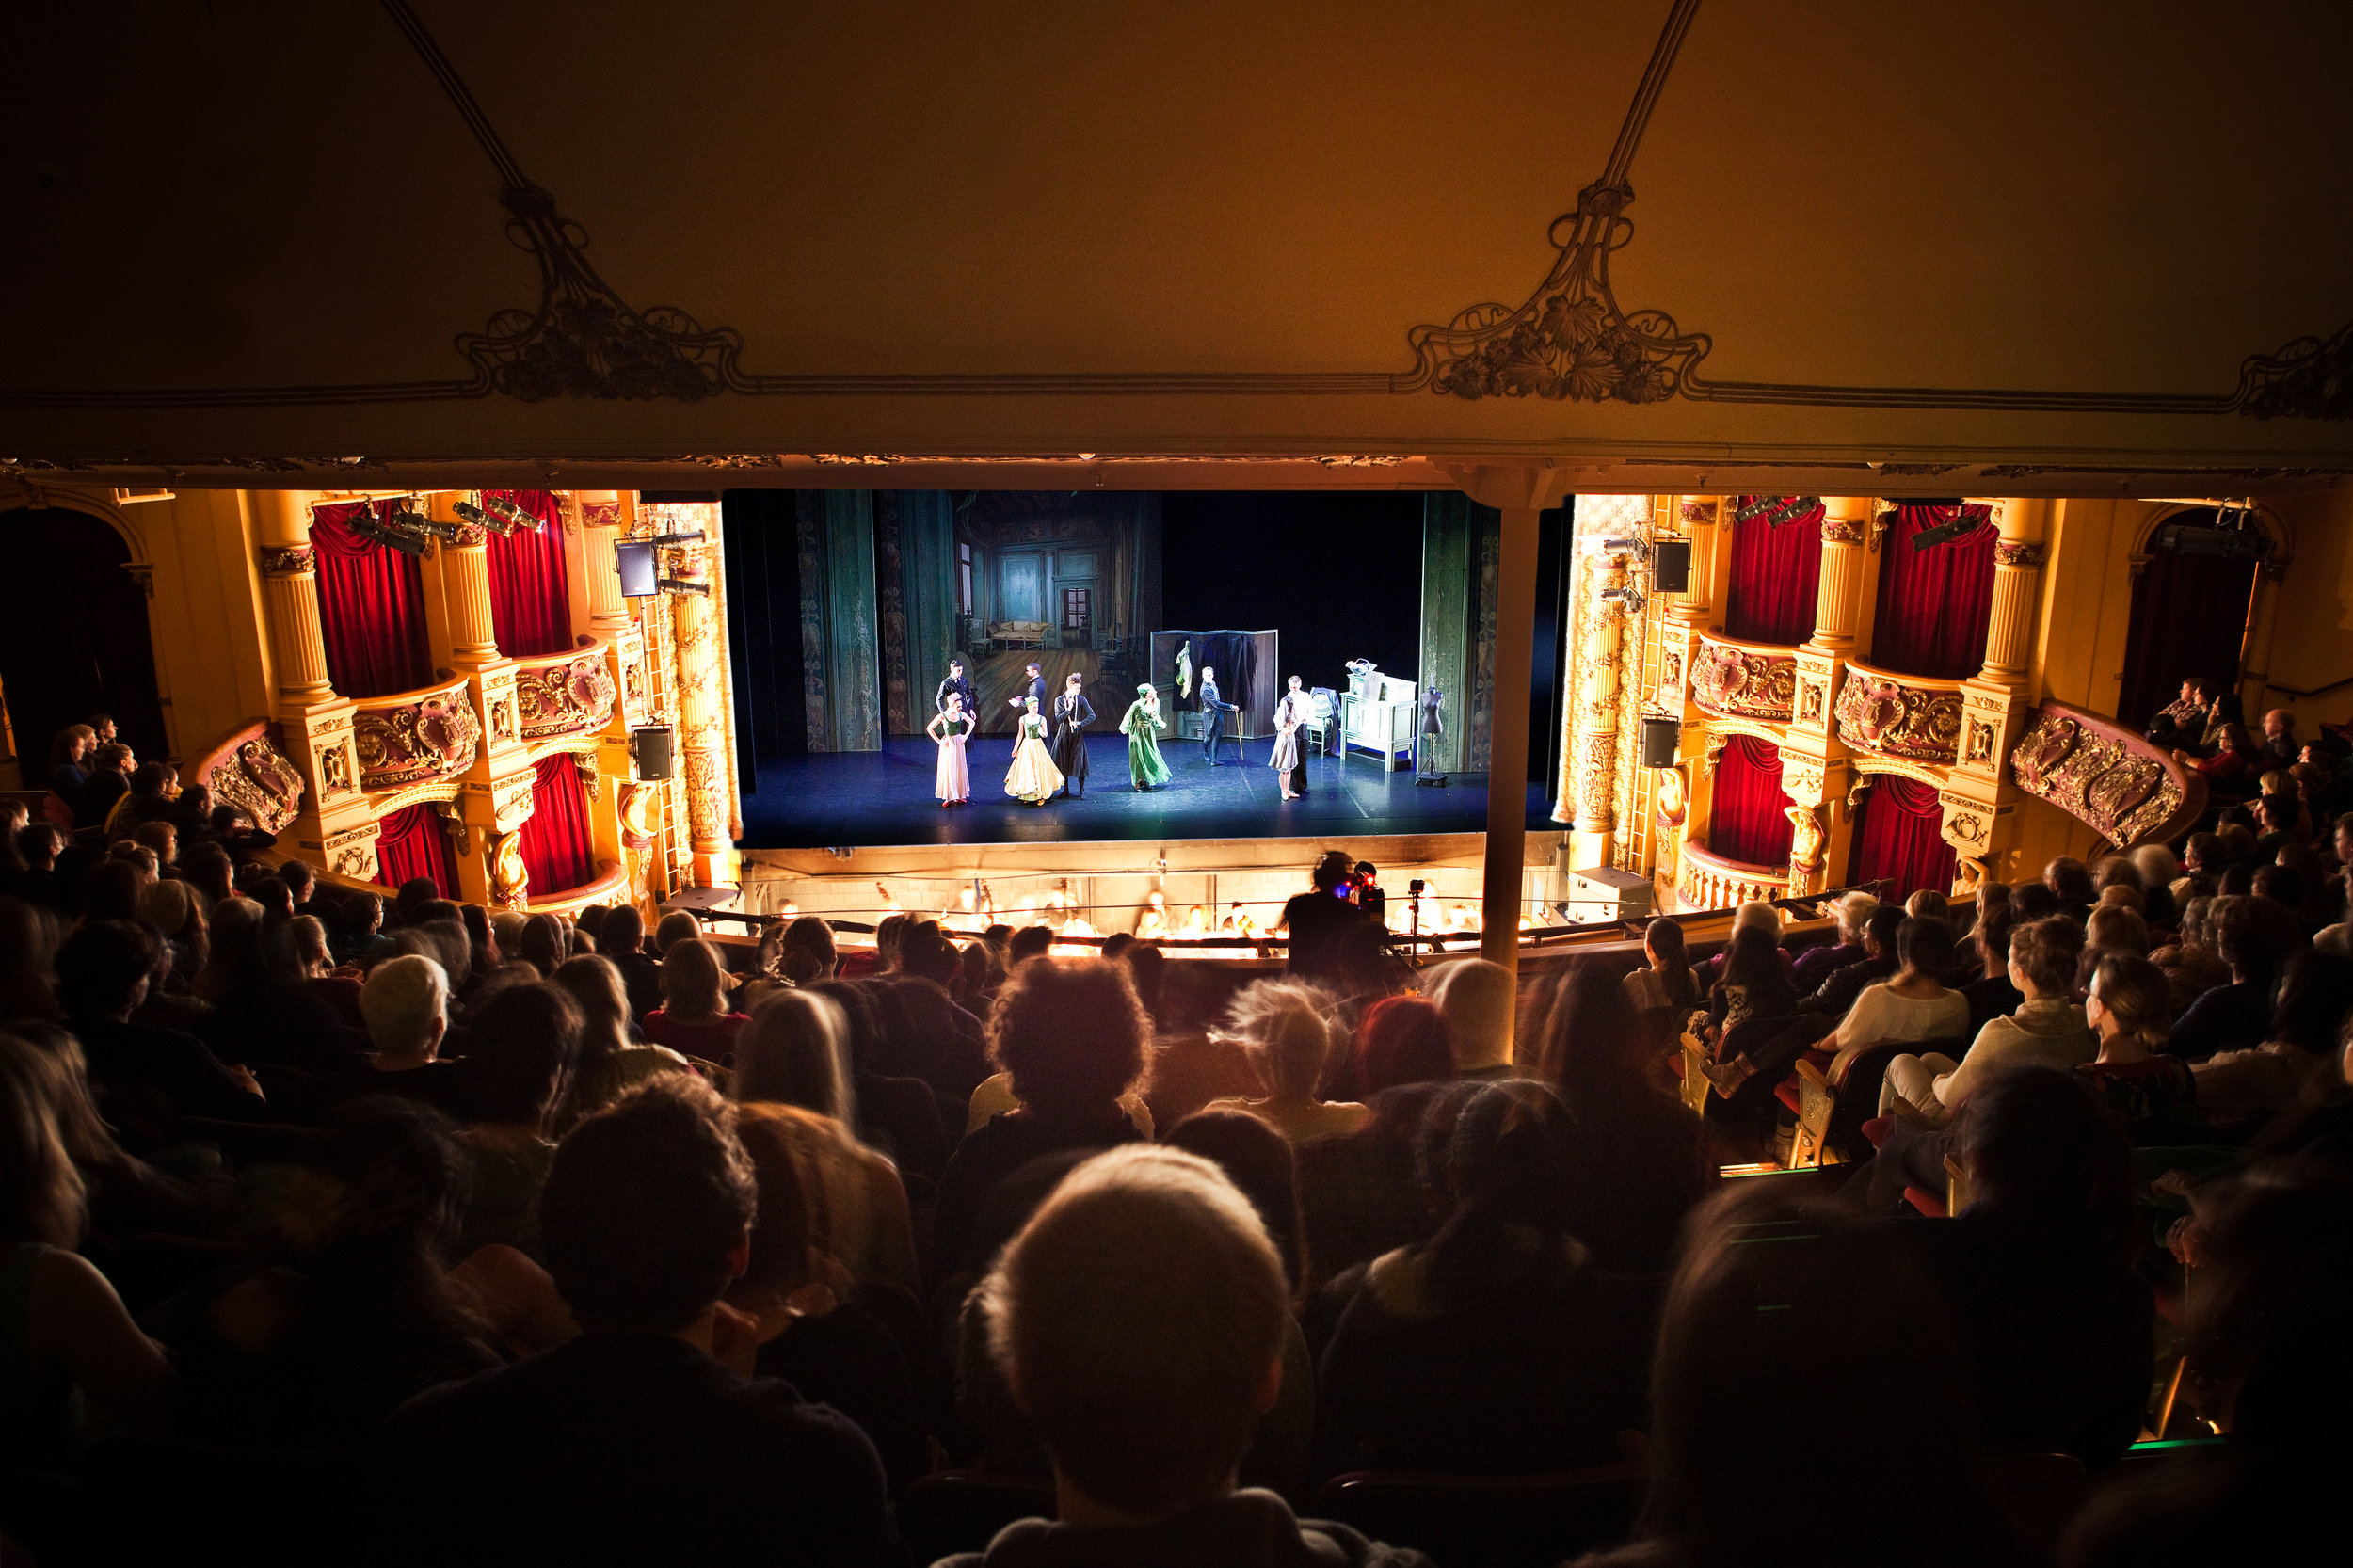 St. James Theatre- 3 minutes' walk